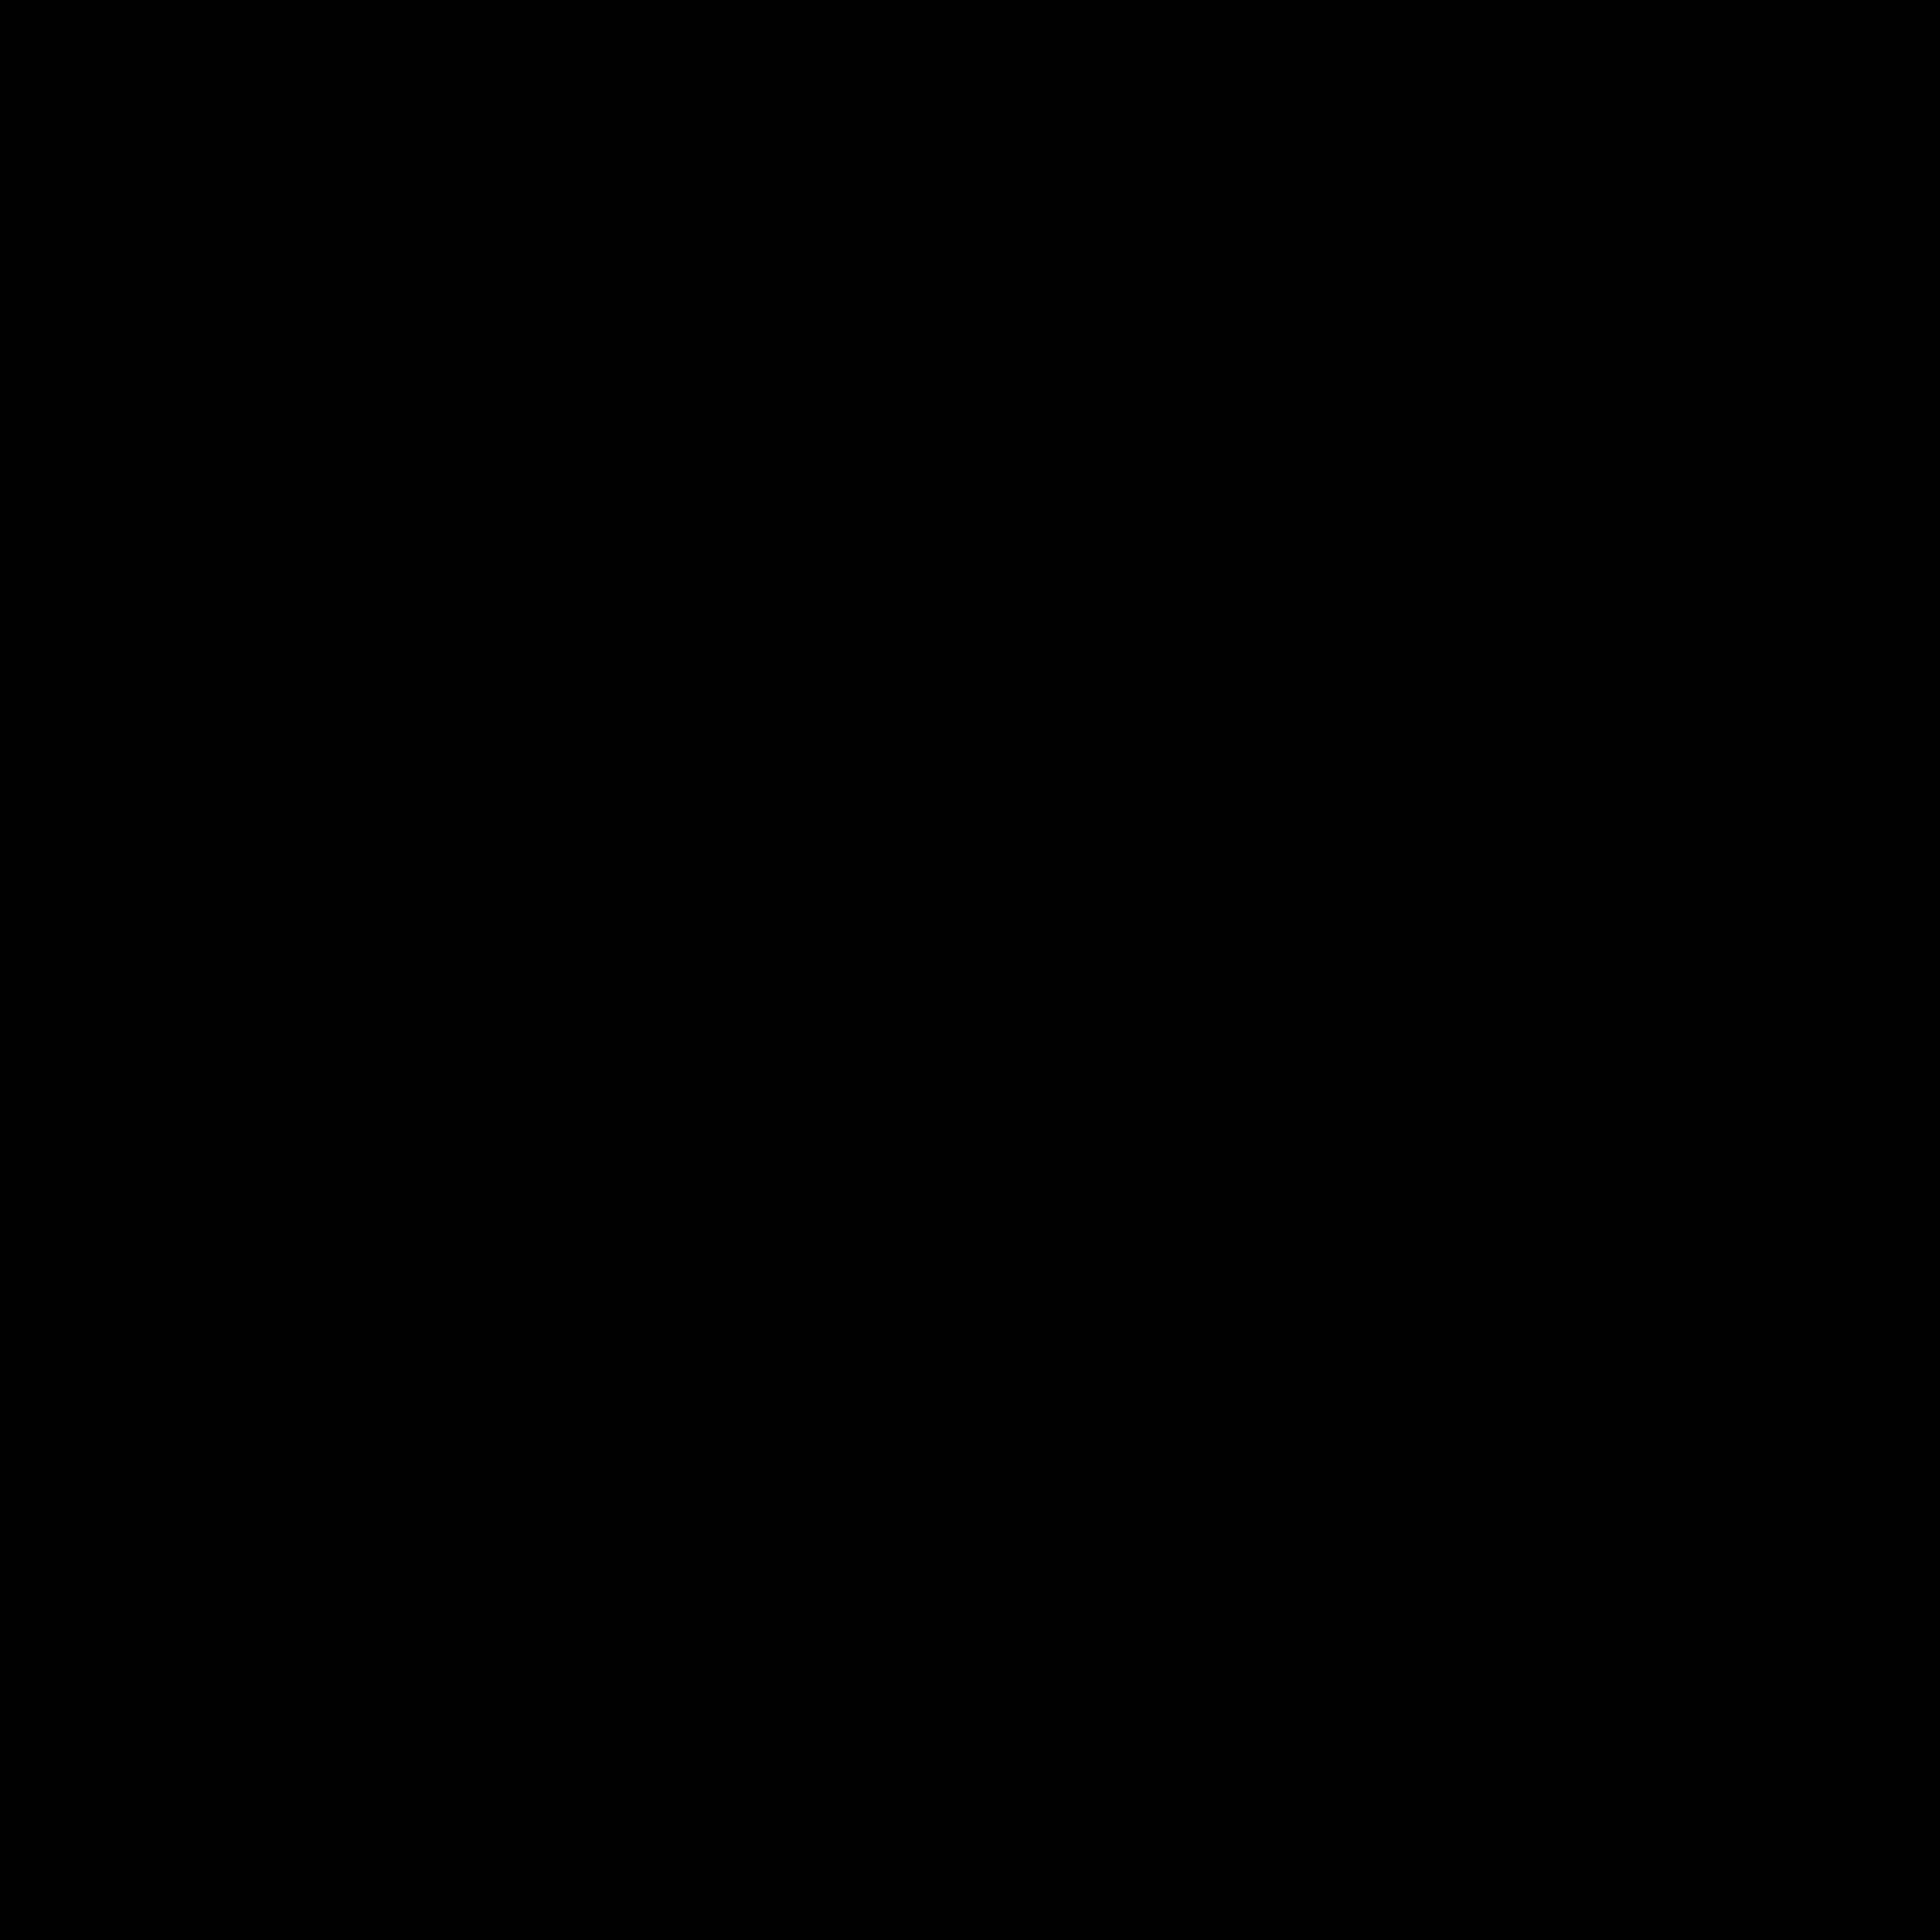 Maltese cross line art. Crucifix clipart cros